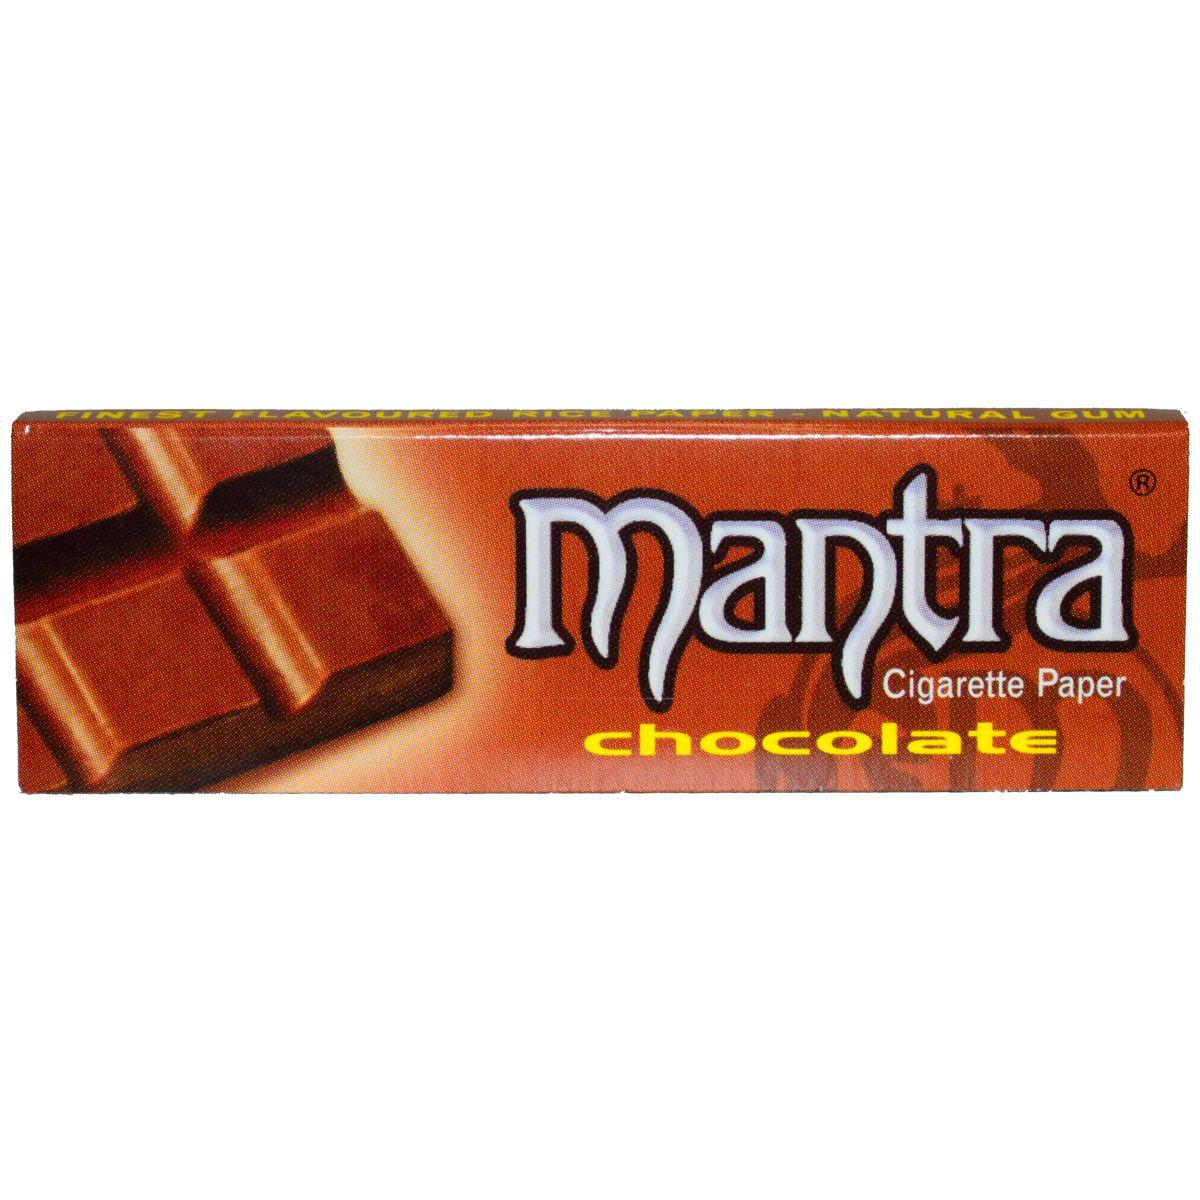 papel mantra chocolate fumar